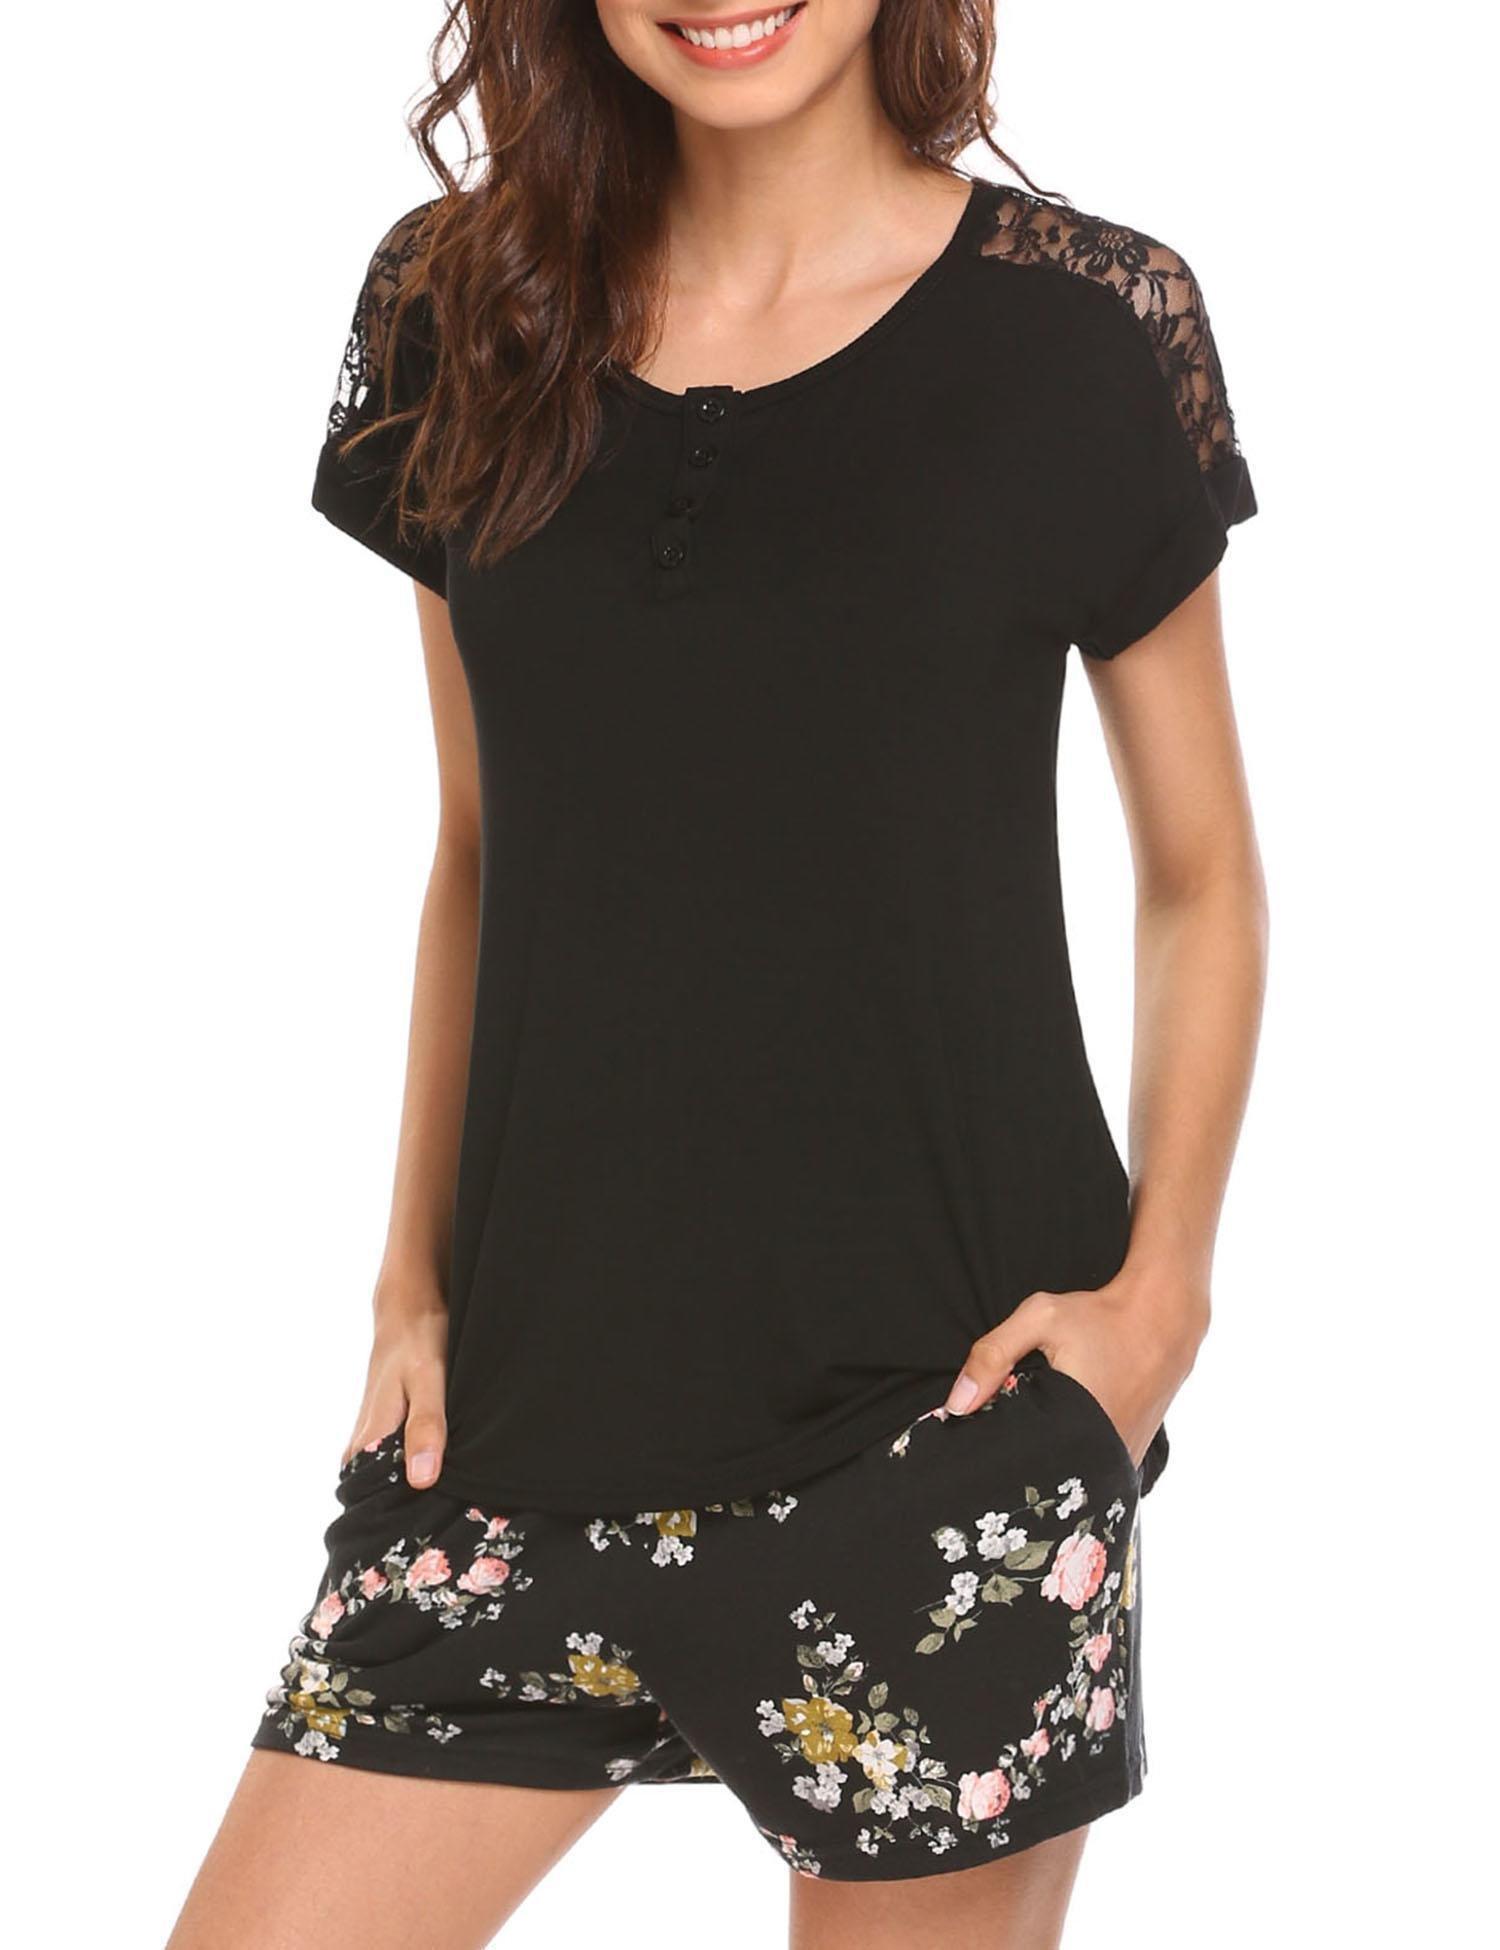 MAXMODA Cotton Cami Shorts Sleep Set Nightgown Sets for Women Black L